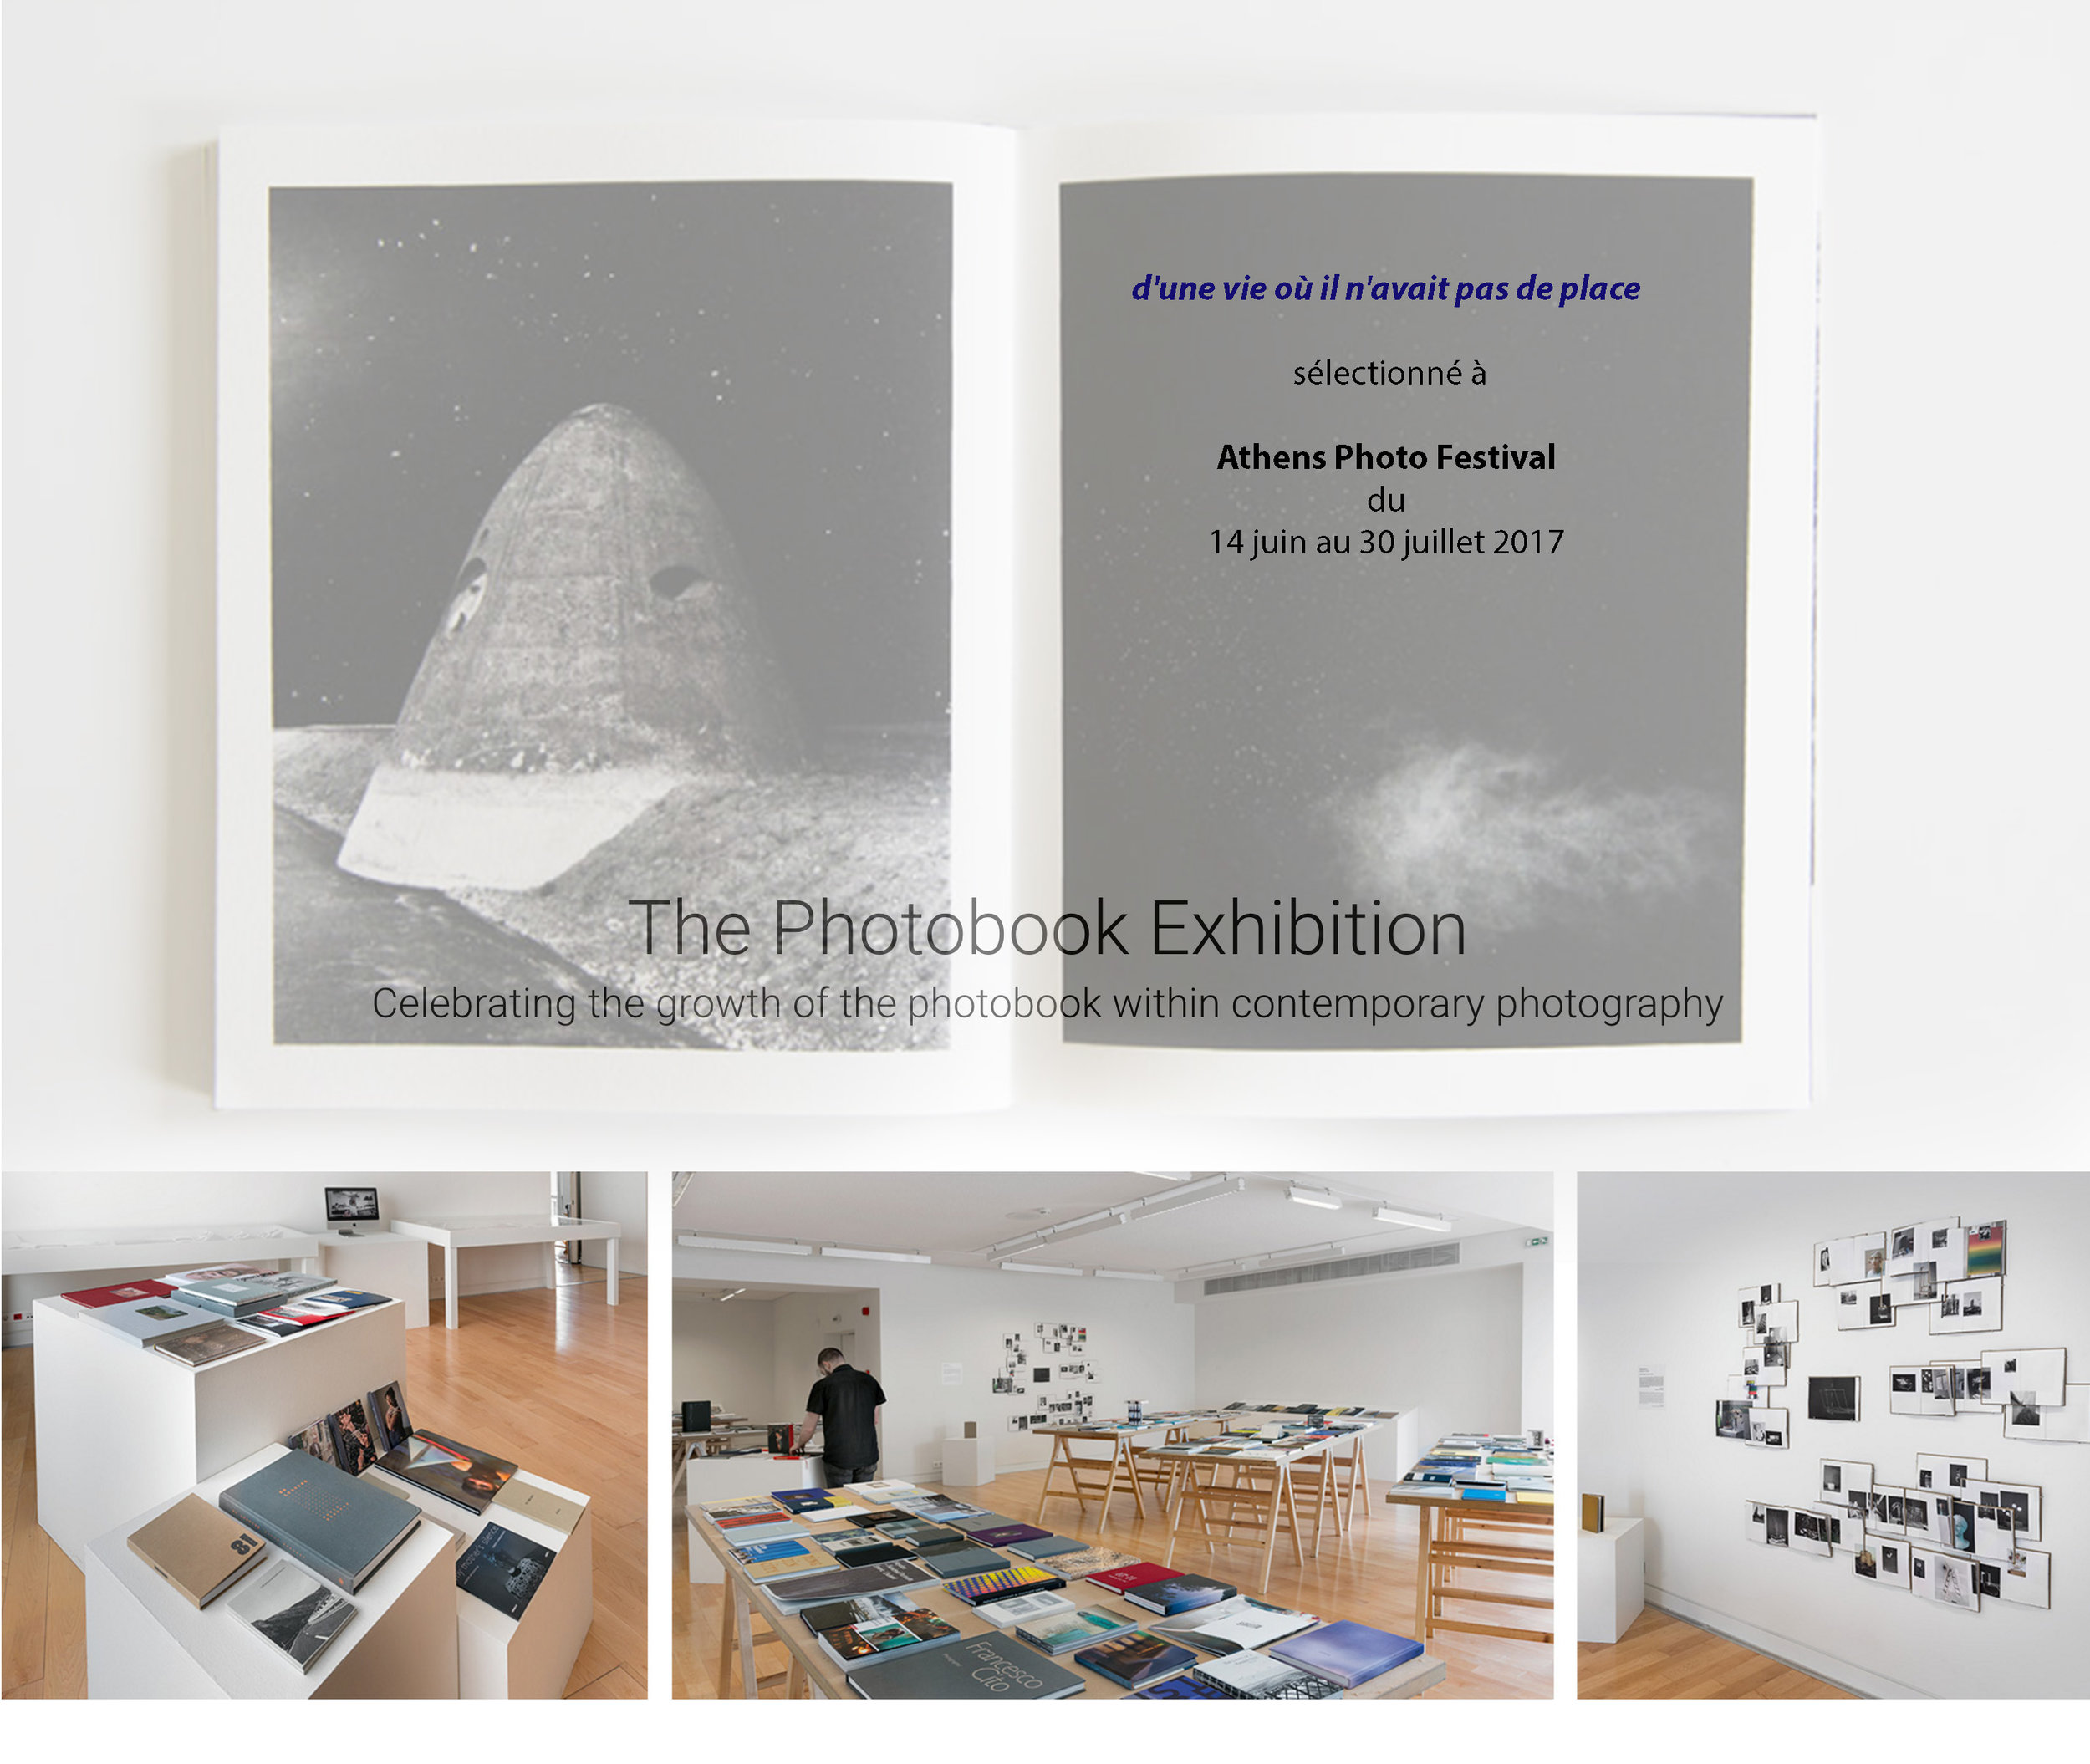 http://www.photofestival.gr/about   http://www.photofestival.gr/photobook-exhibiition